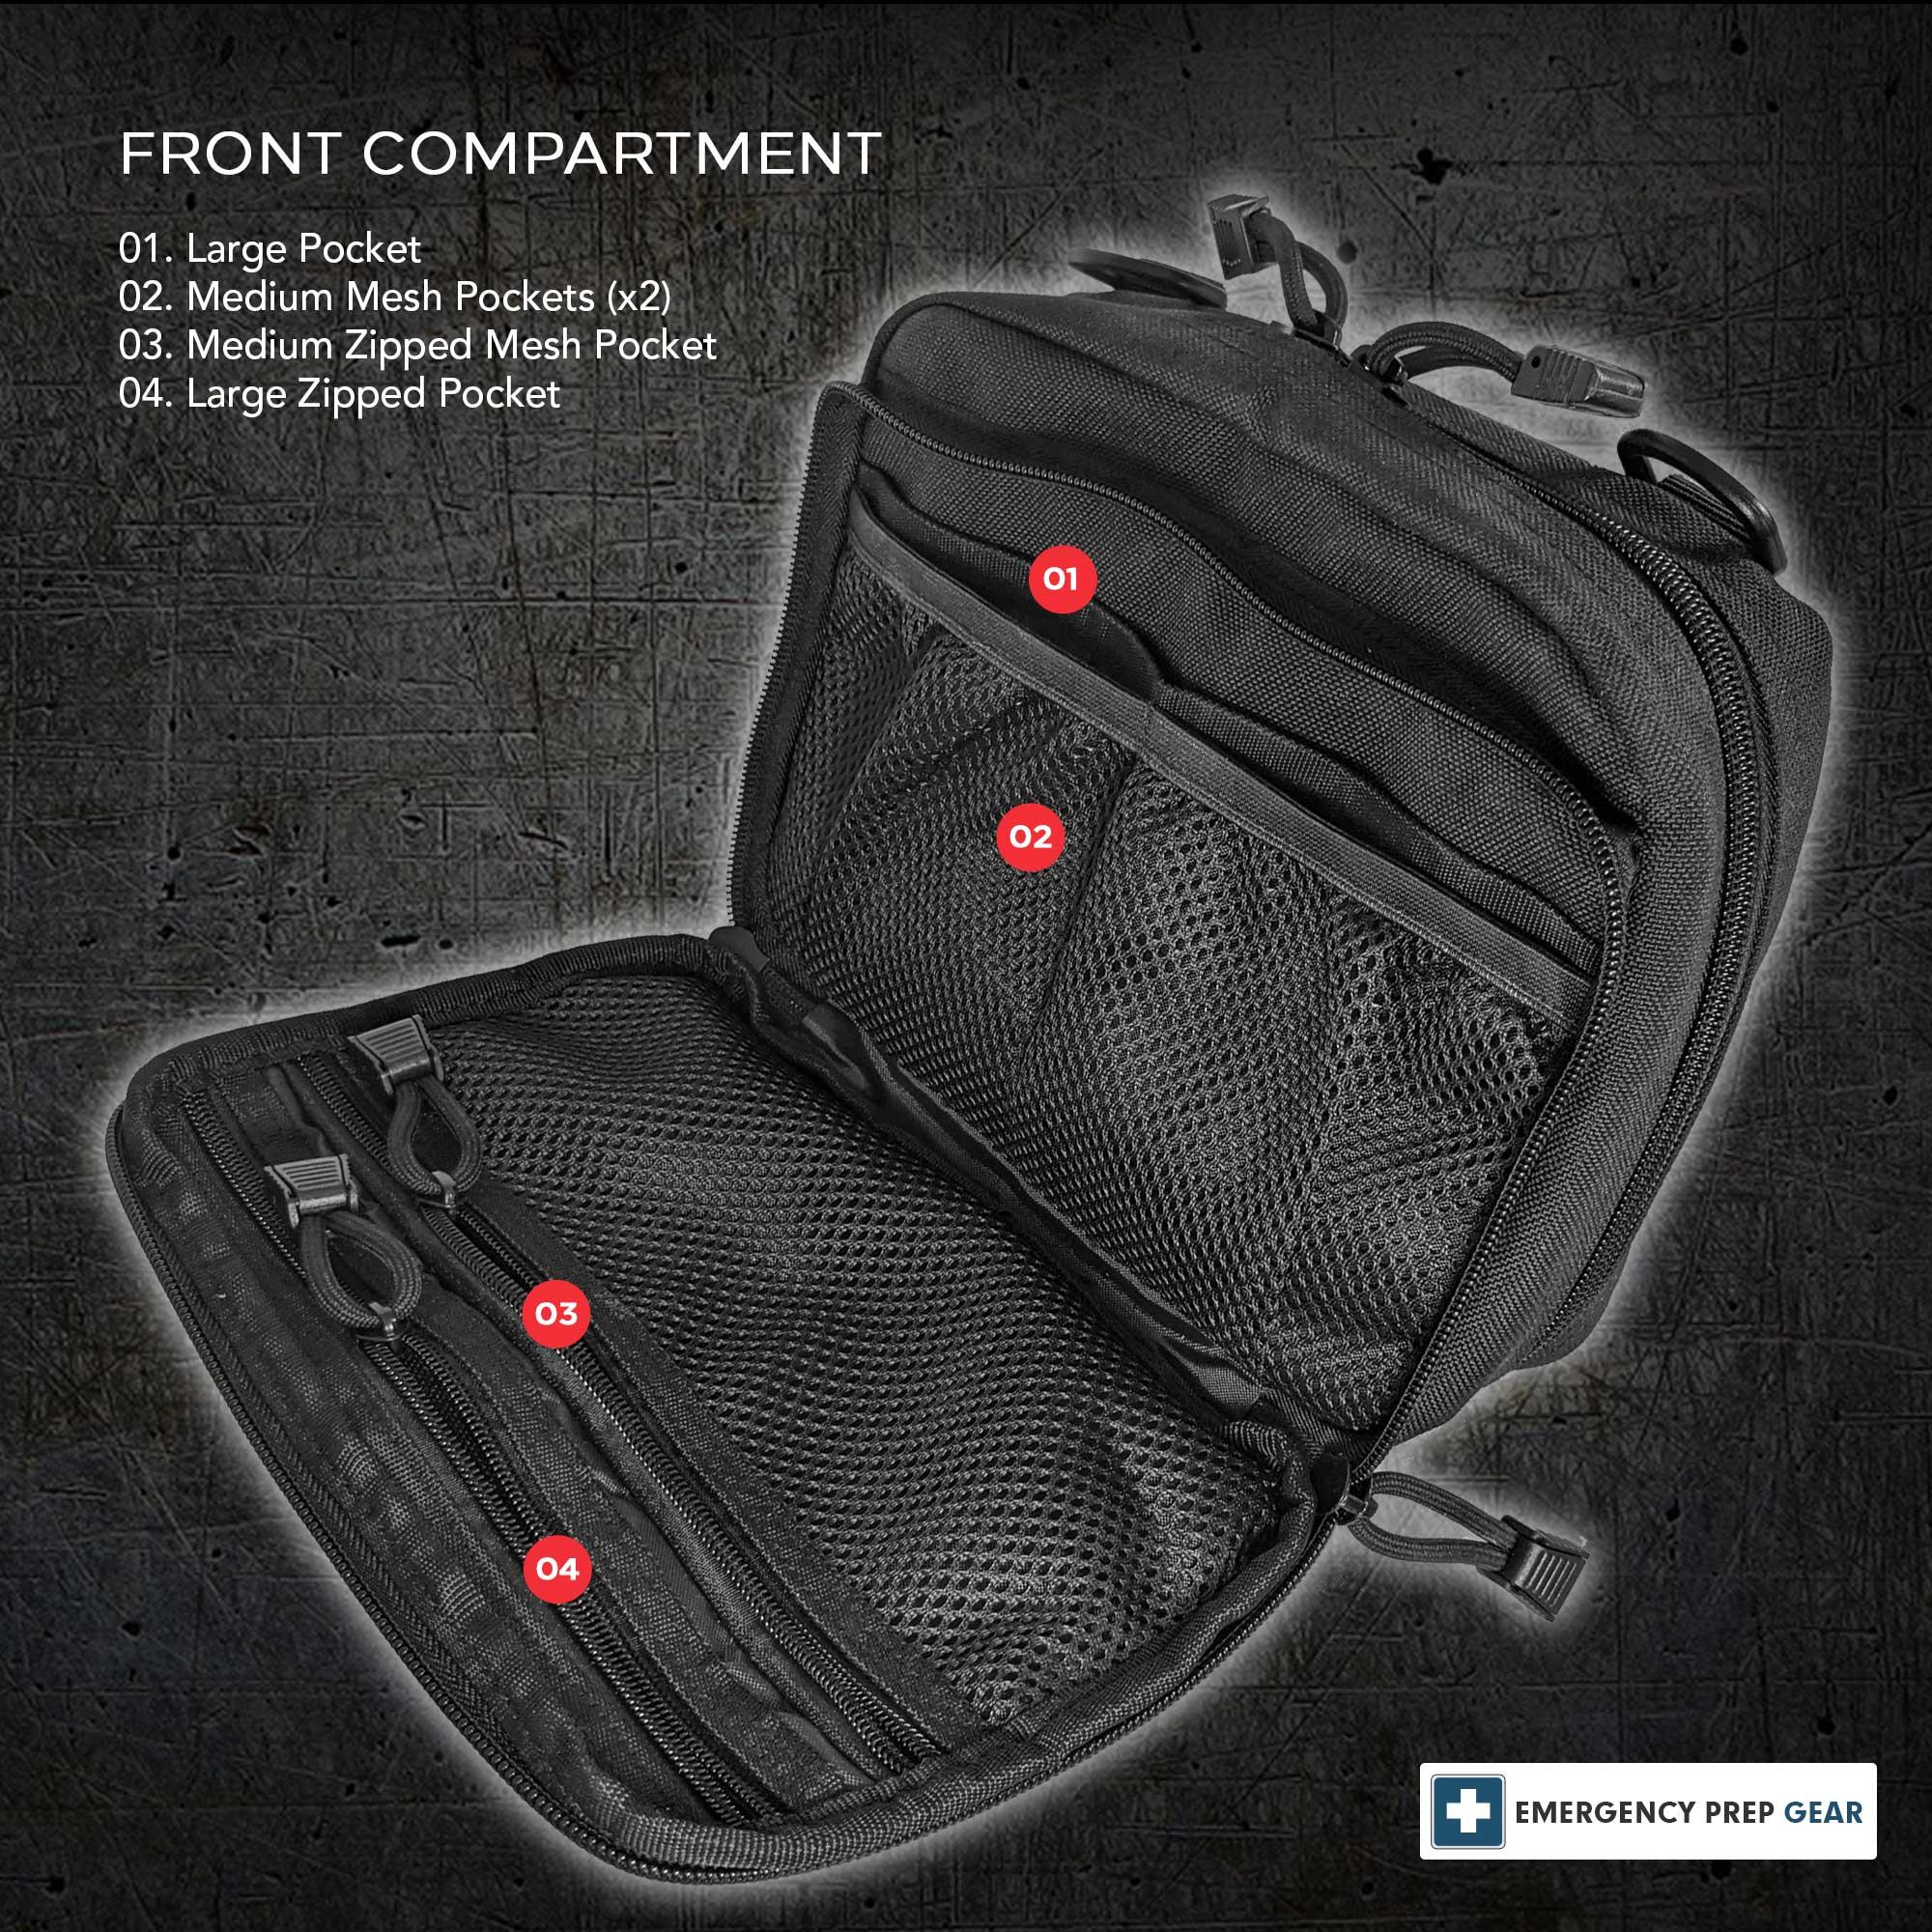 21 10 08 16 21 46 original b09dqz9vnl epg gear black compartment2